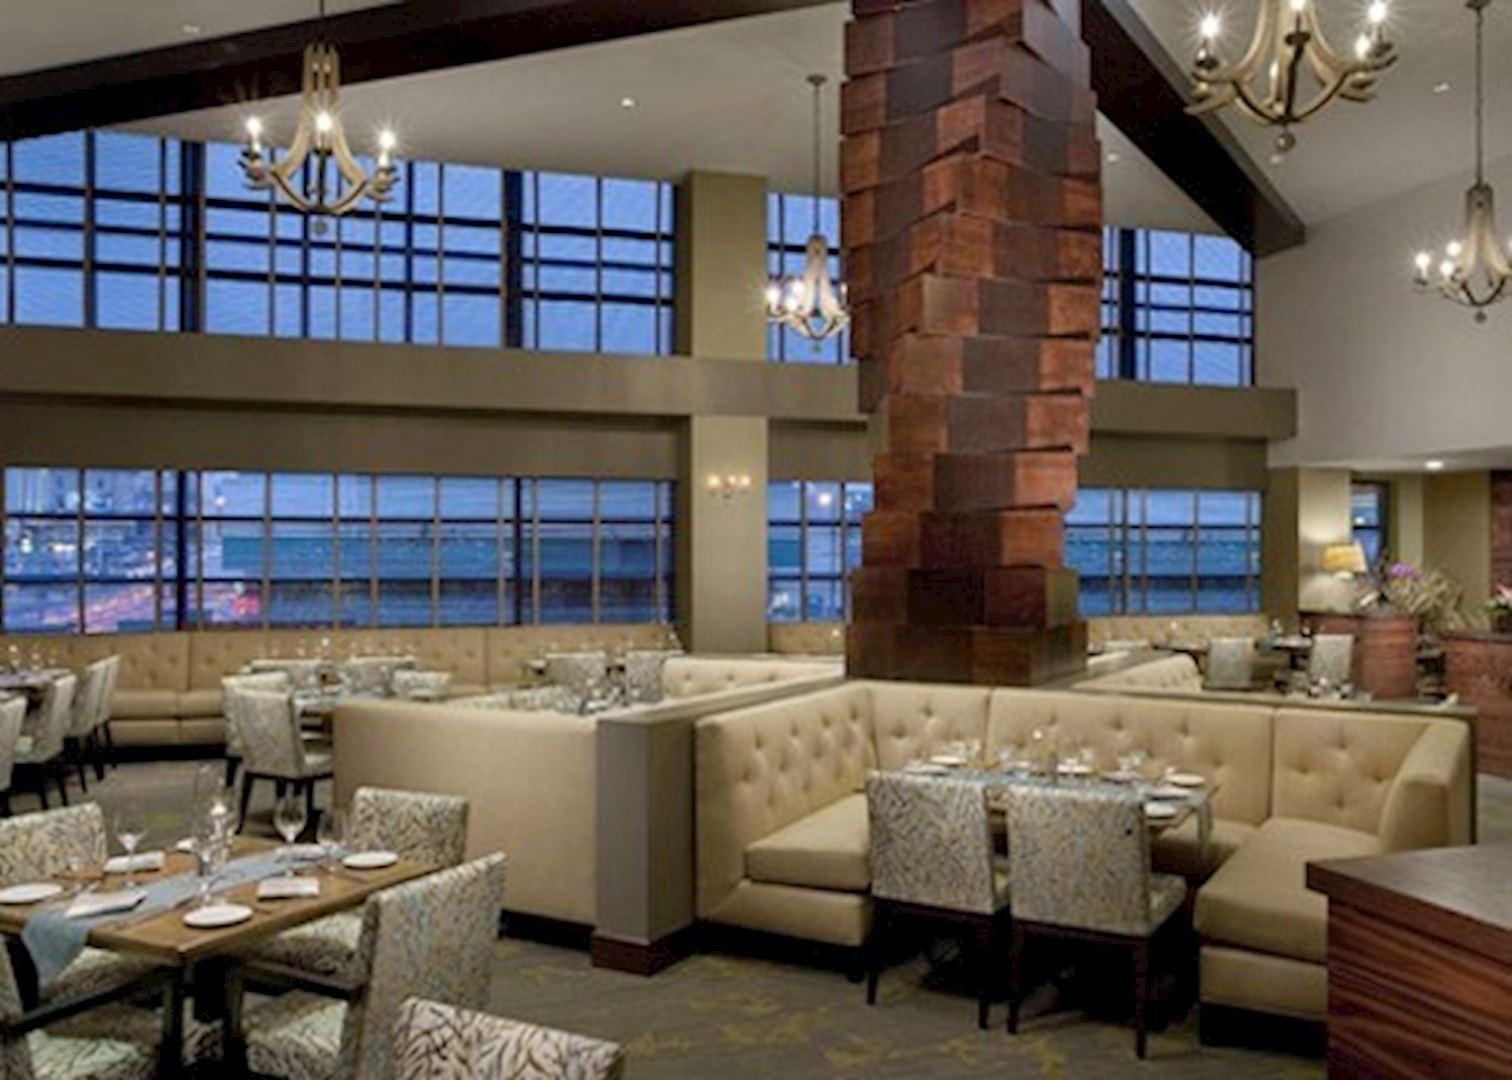 Nashville+hotel+casinos doubledown casino poker promo codes free chips